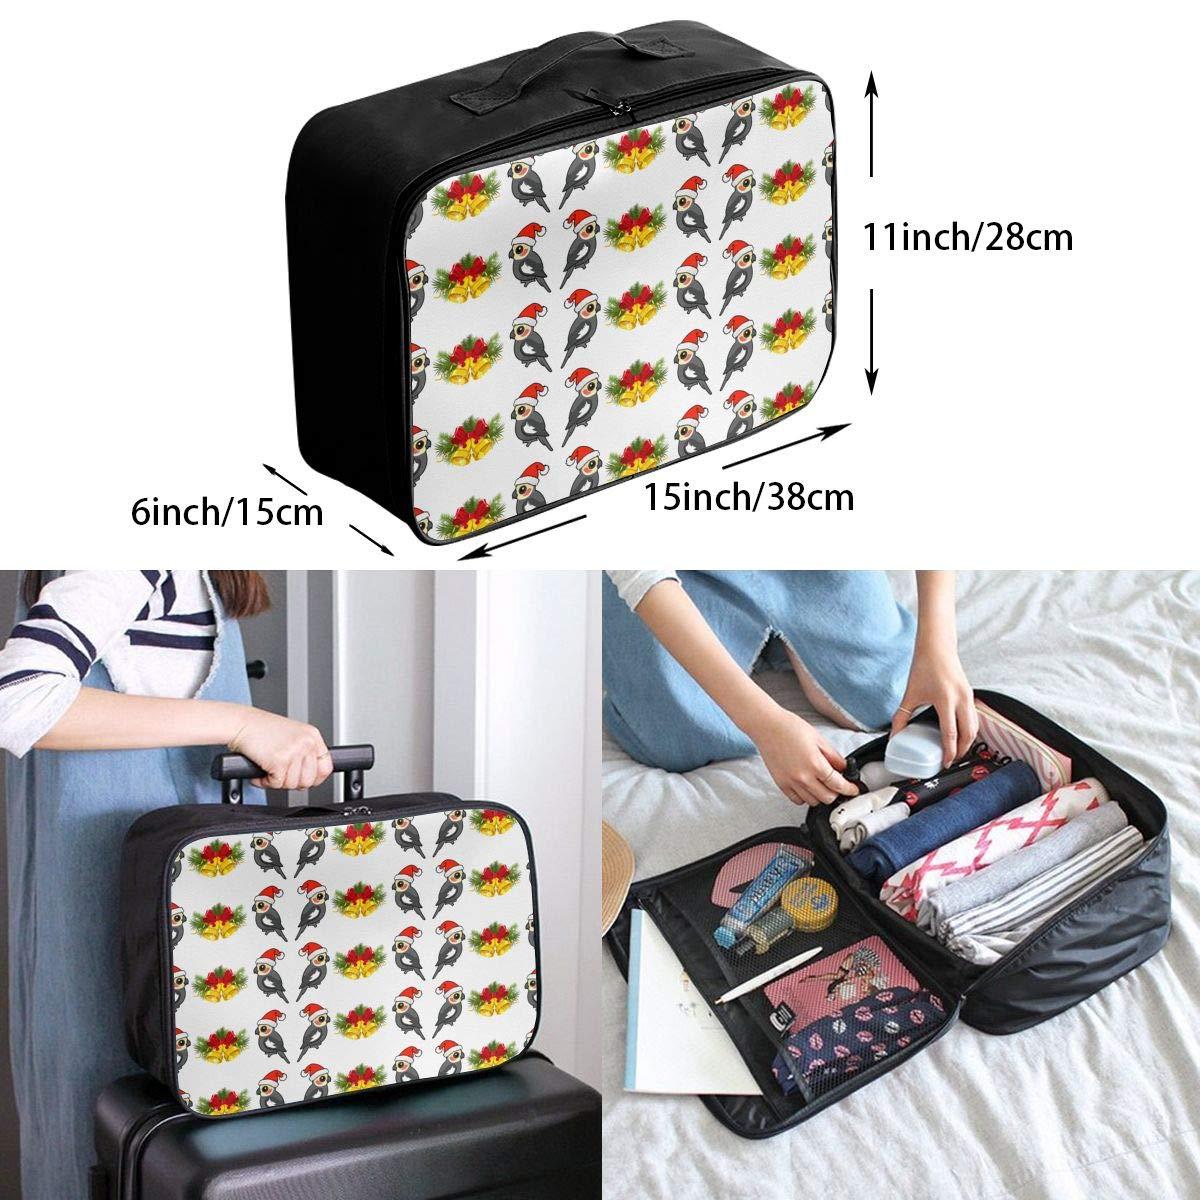 Cute Cockatiel Santa Christman Jingle Travel Duffel Bag Waterproof Fashion Lightweight Large Capacity Portable Luggage Bag